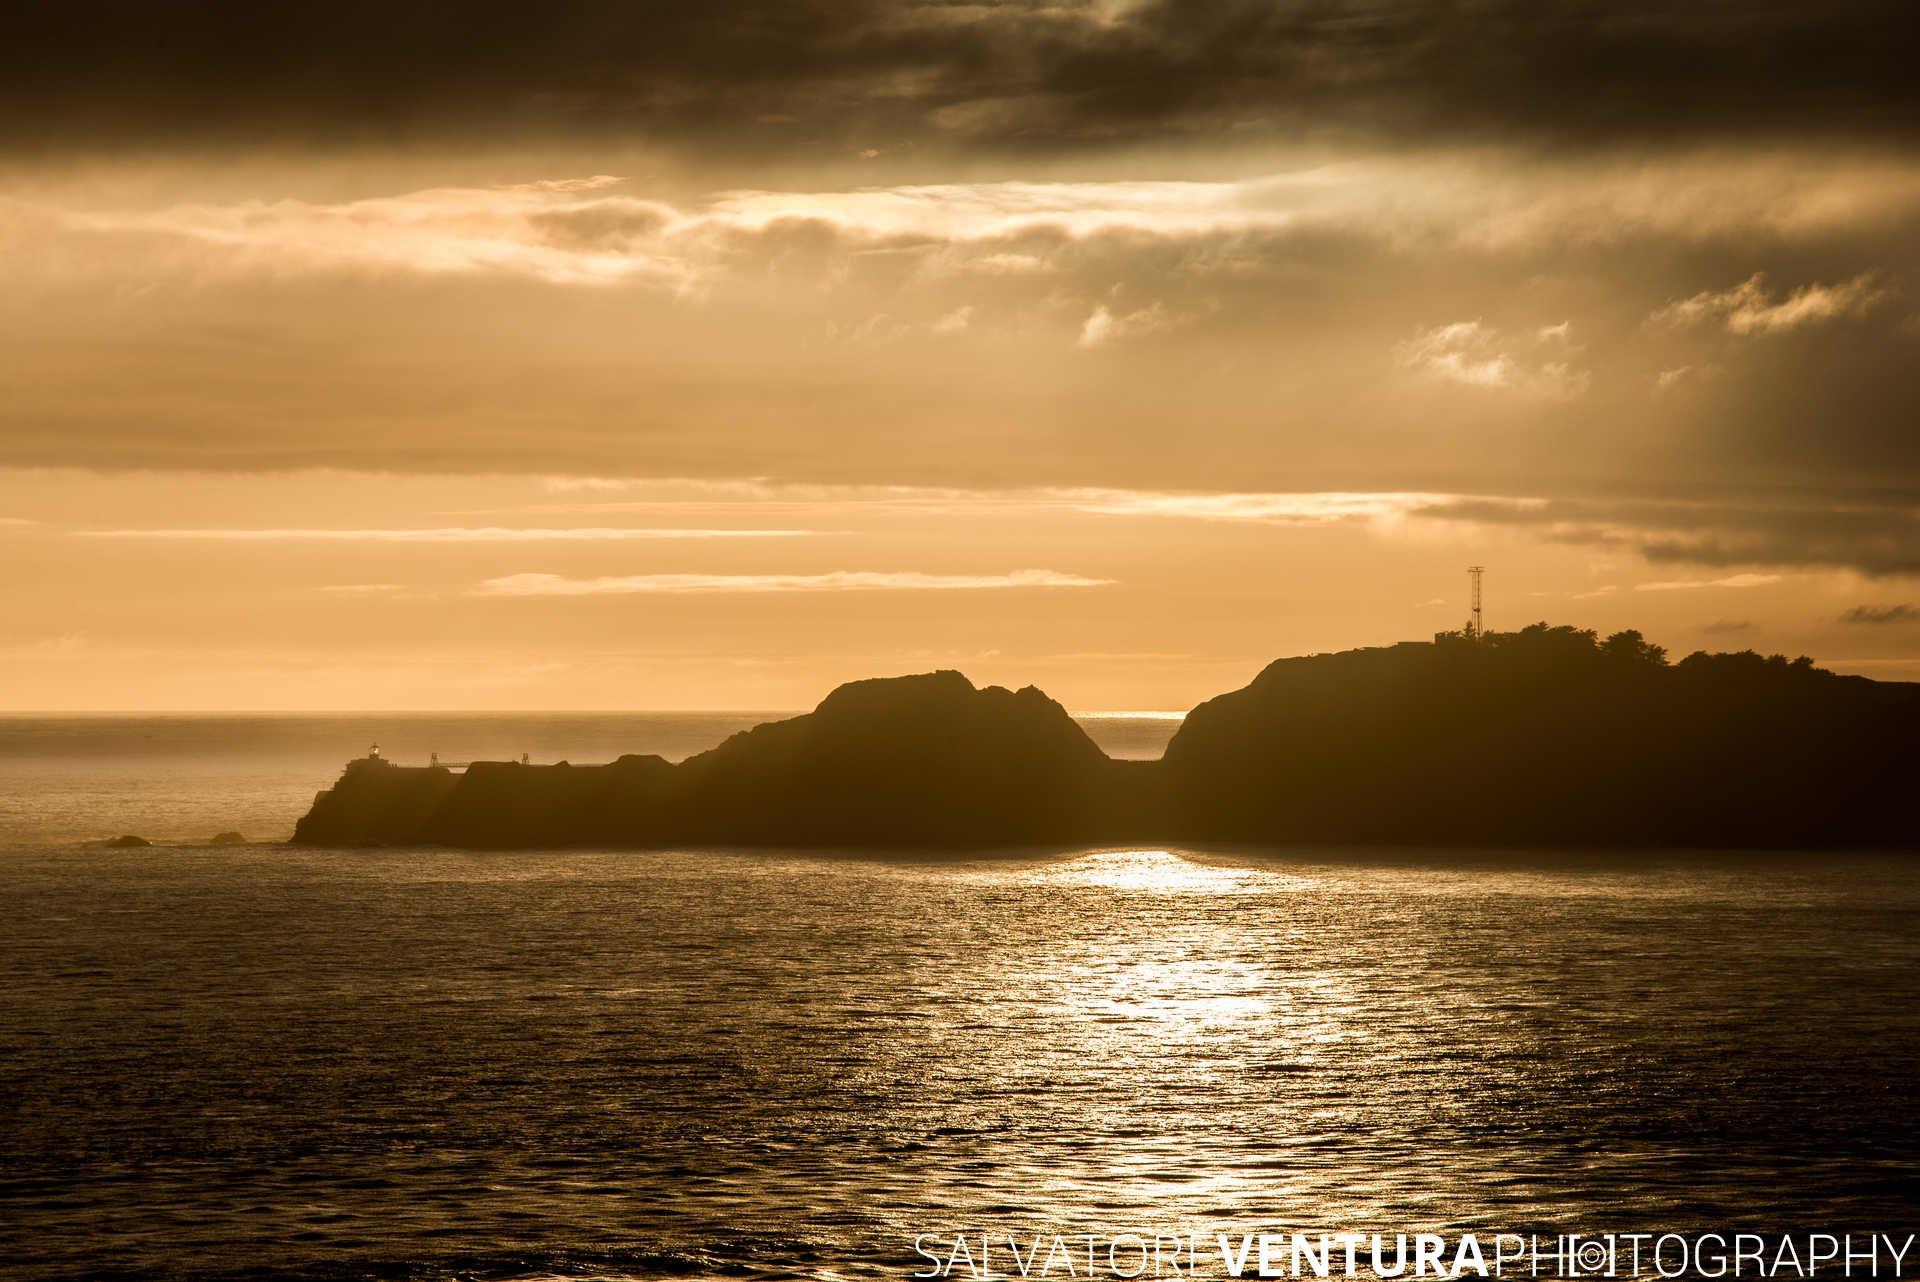 Point Bonita Lighthouse at Sunset - Salvatore Ventura Ph[o]tography